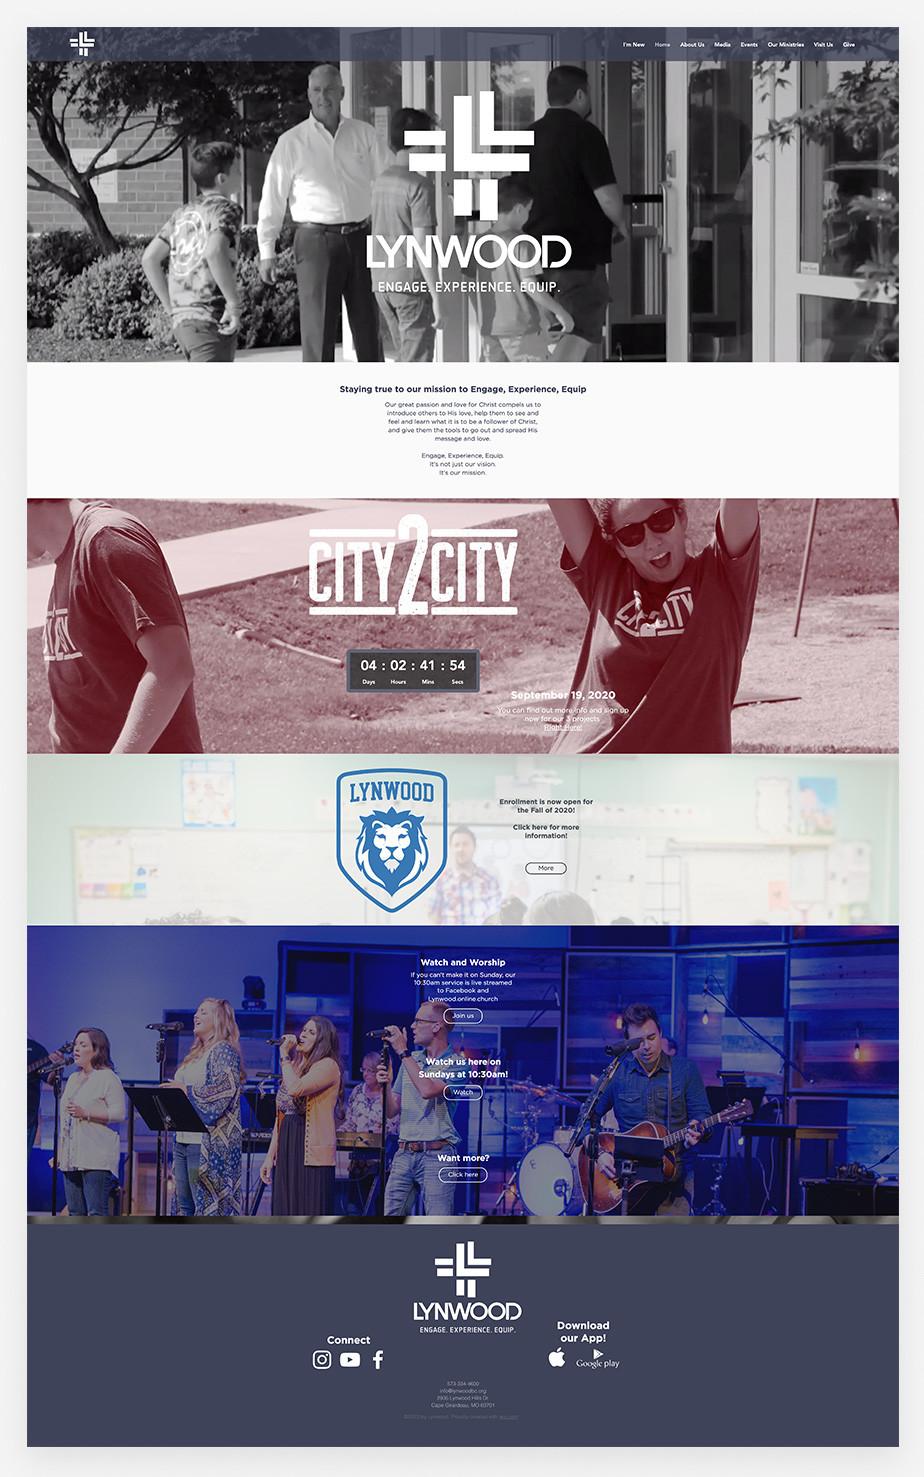 Best church websites example by Lynwood Church